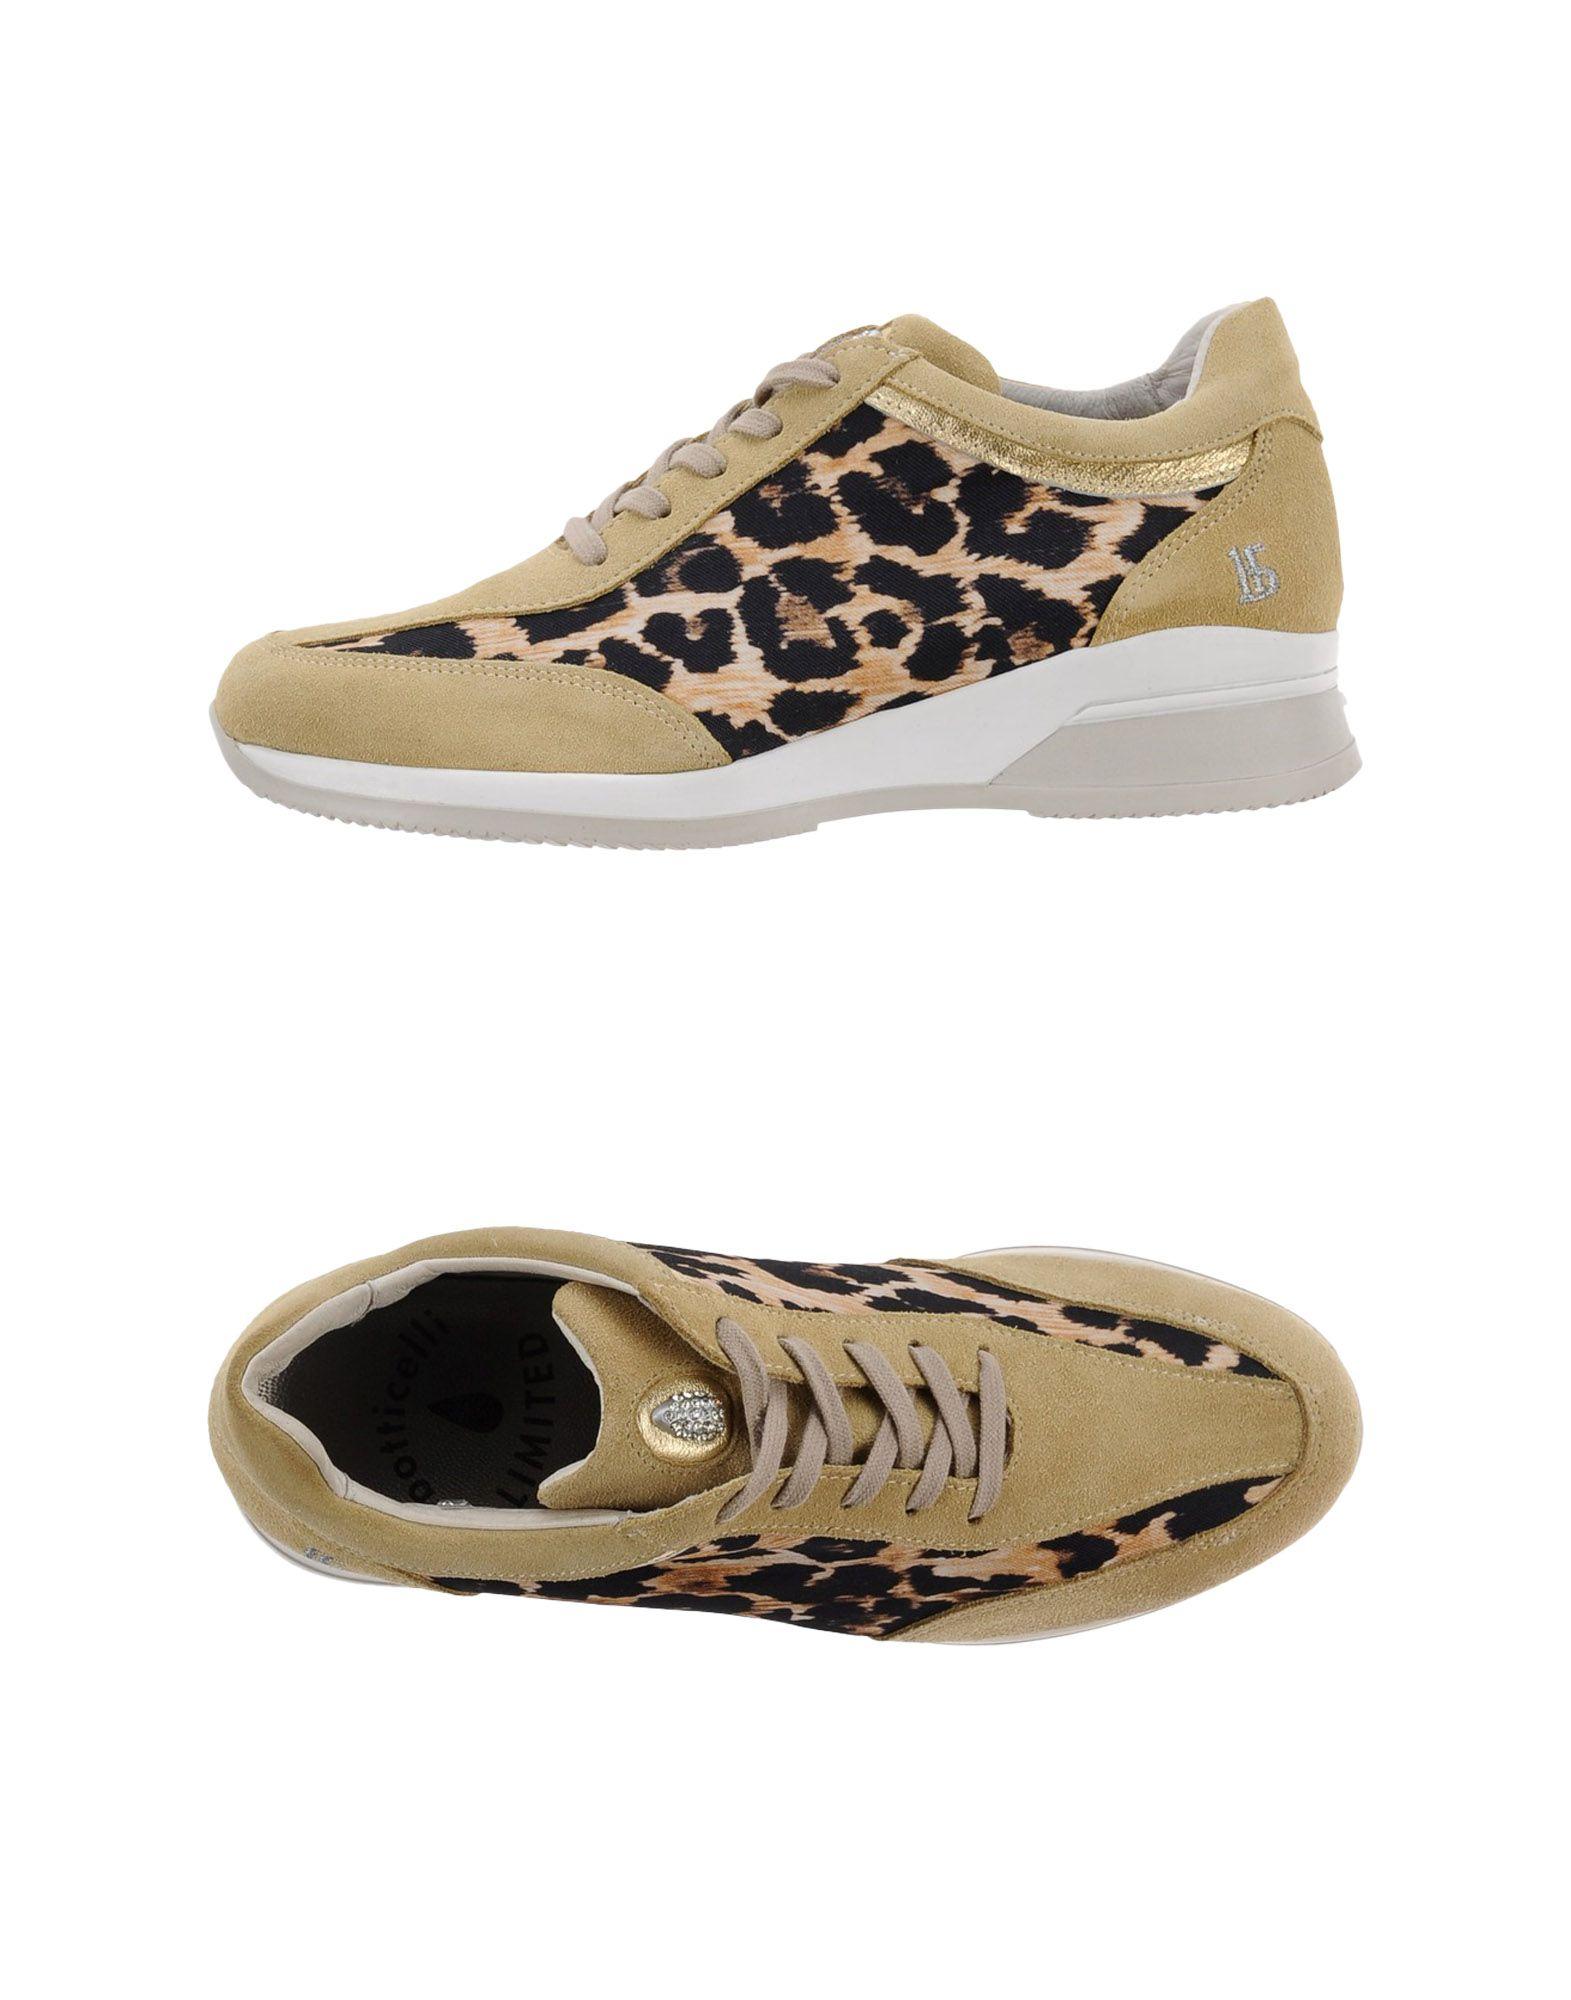 Botticelli Limited Sneakers - Women Botticelli Limited Sneakers - online on  Canada - Sneakers 44754740NX 85dd49